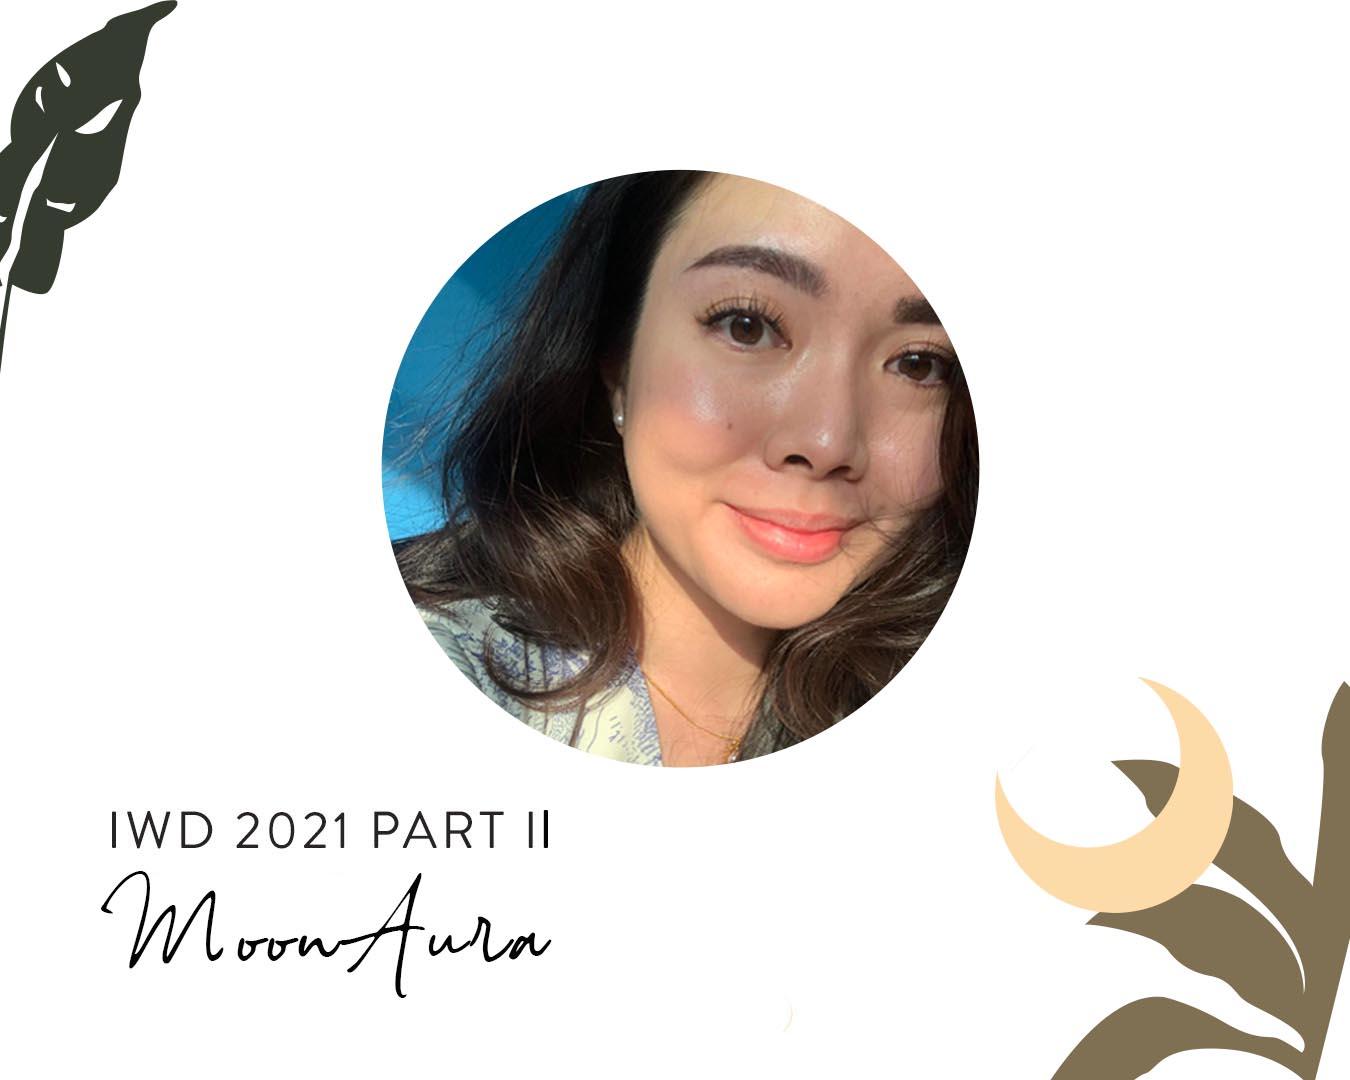 IWD 2021 Part II: Moonaura